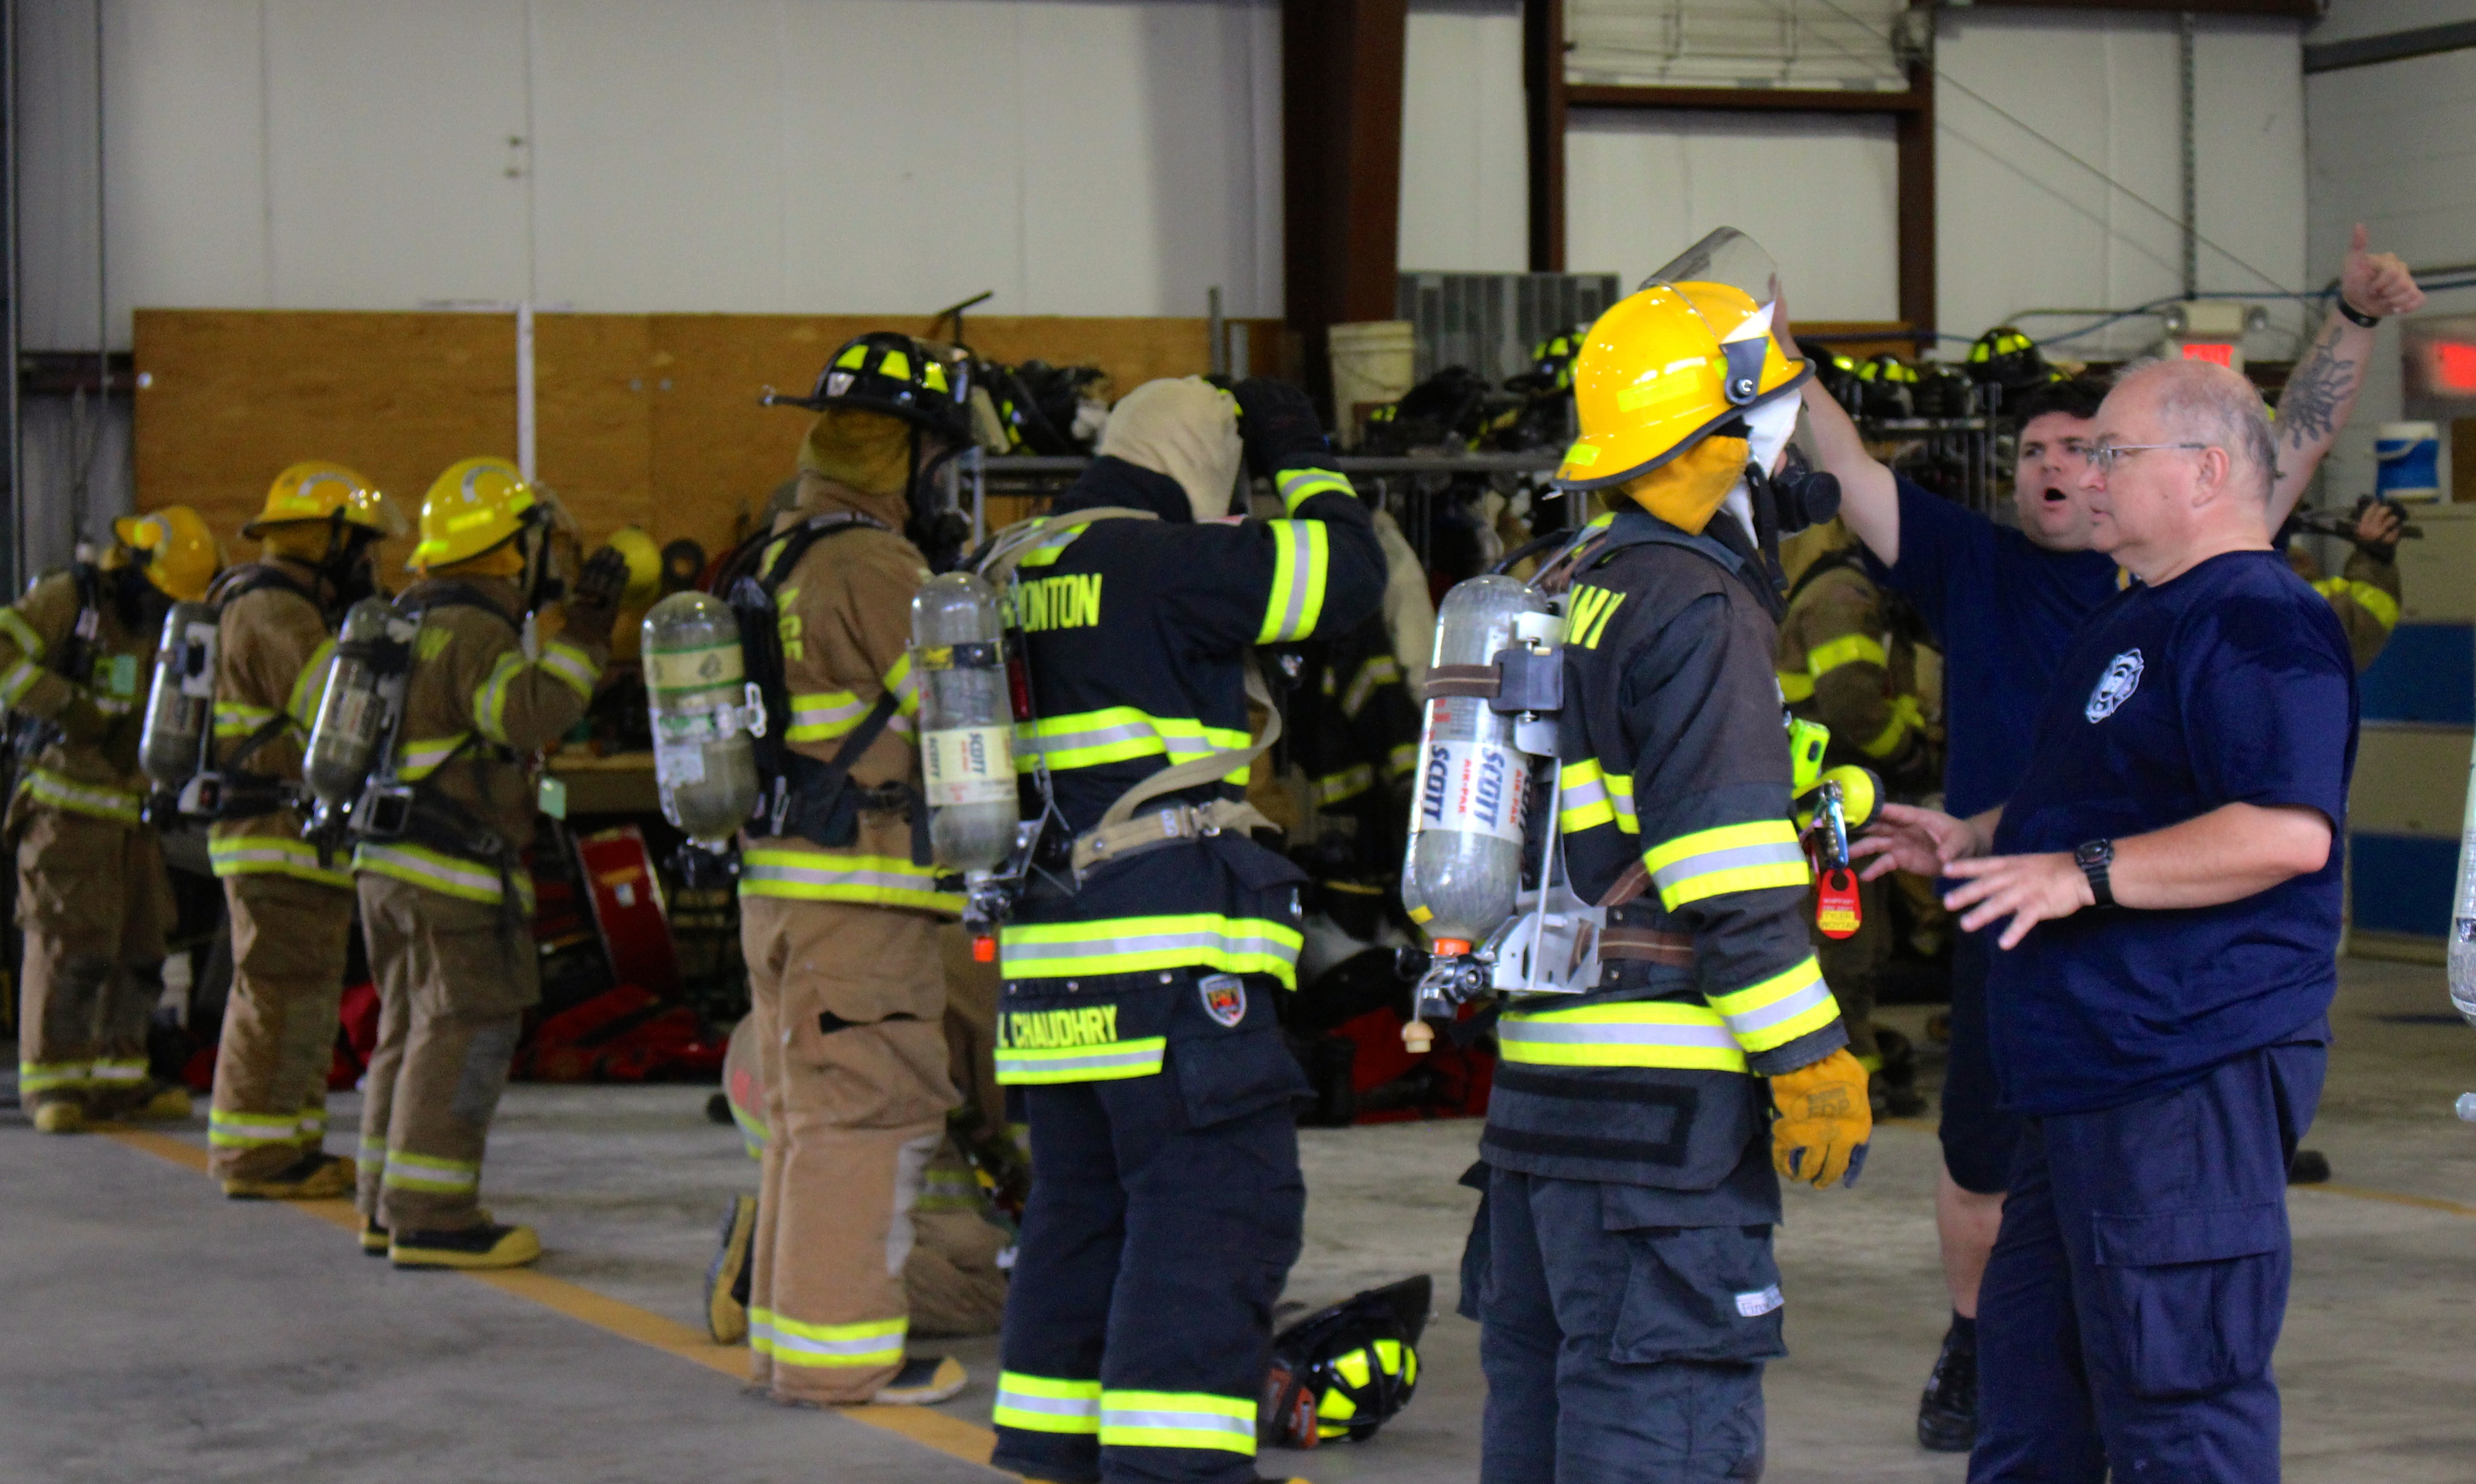 e4497db9de4f958acdc6_e4afca803e7854f7fdd6_Recruits_Training_at_Academy_2_by_Ashley.jpg